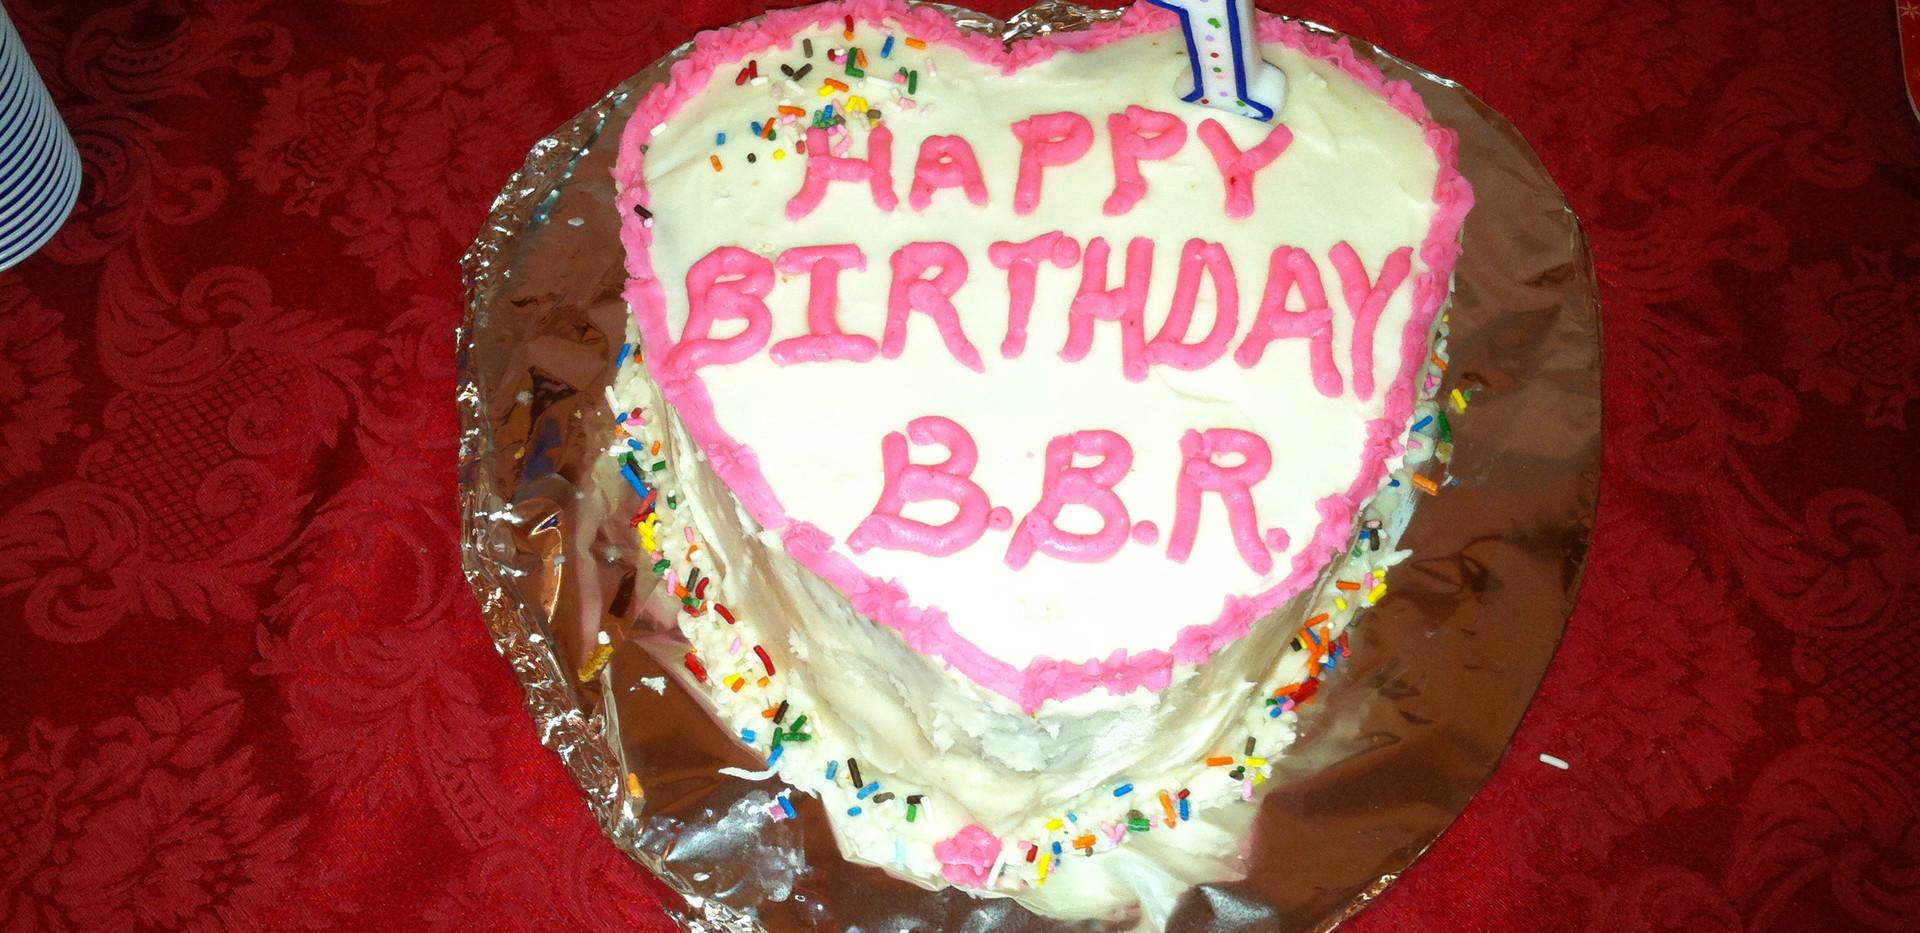 B.B.R. cake